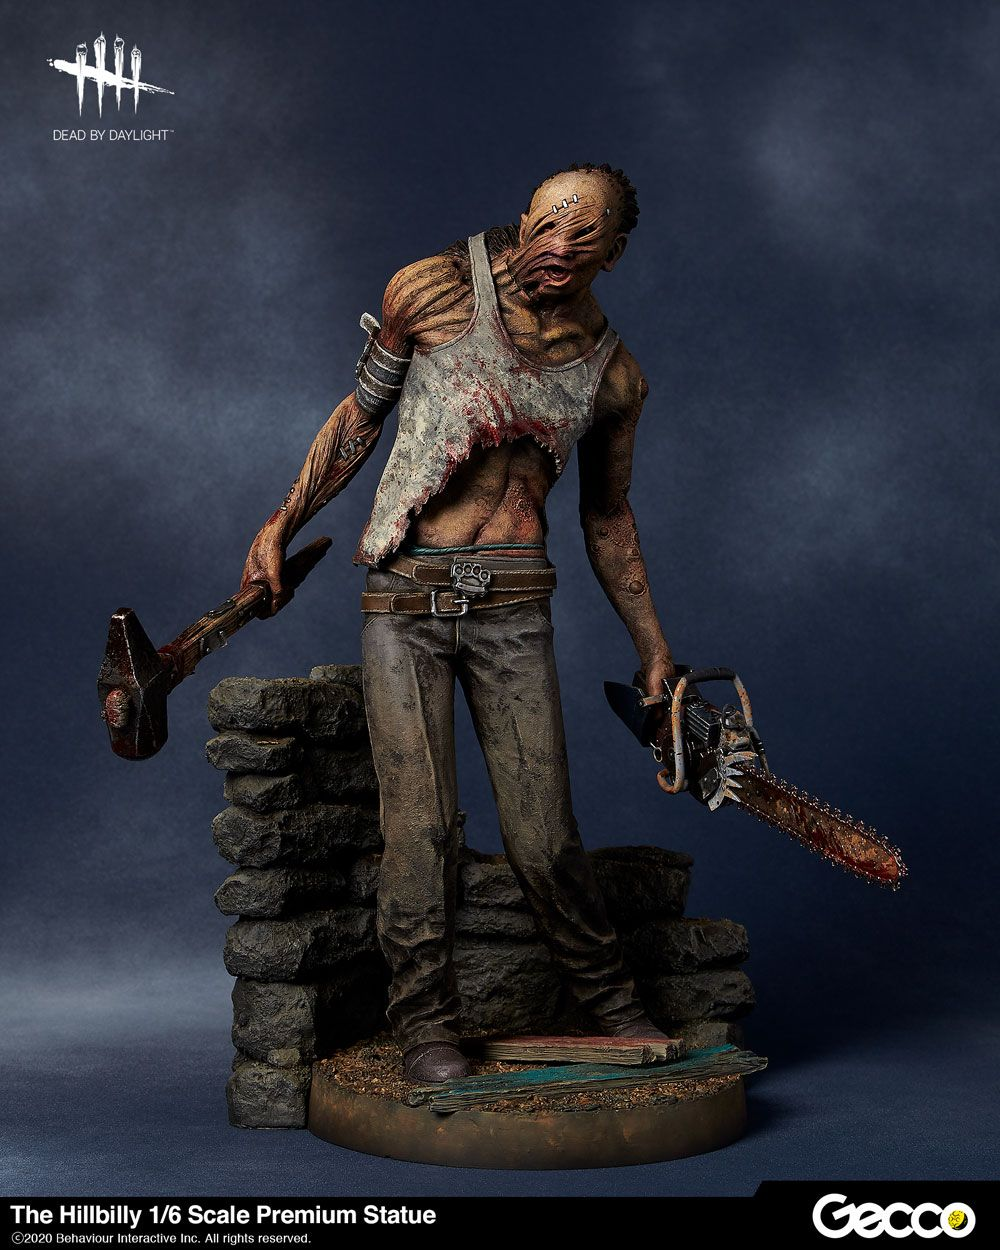 Dead by Daylight PVC Statue 1/6 The Hillbilly 31 cm